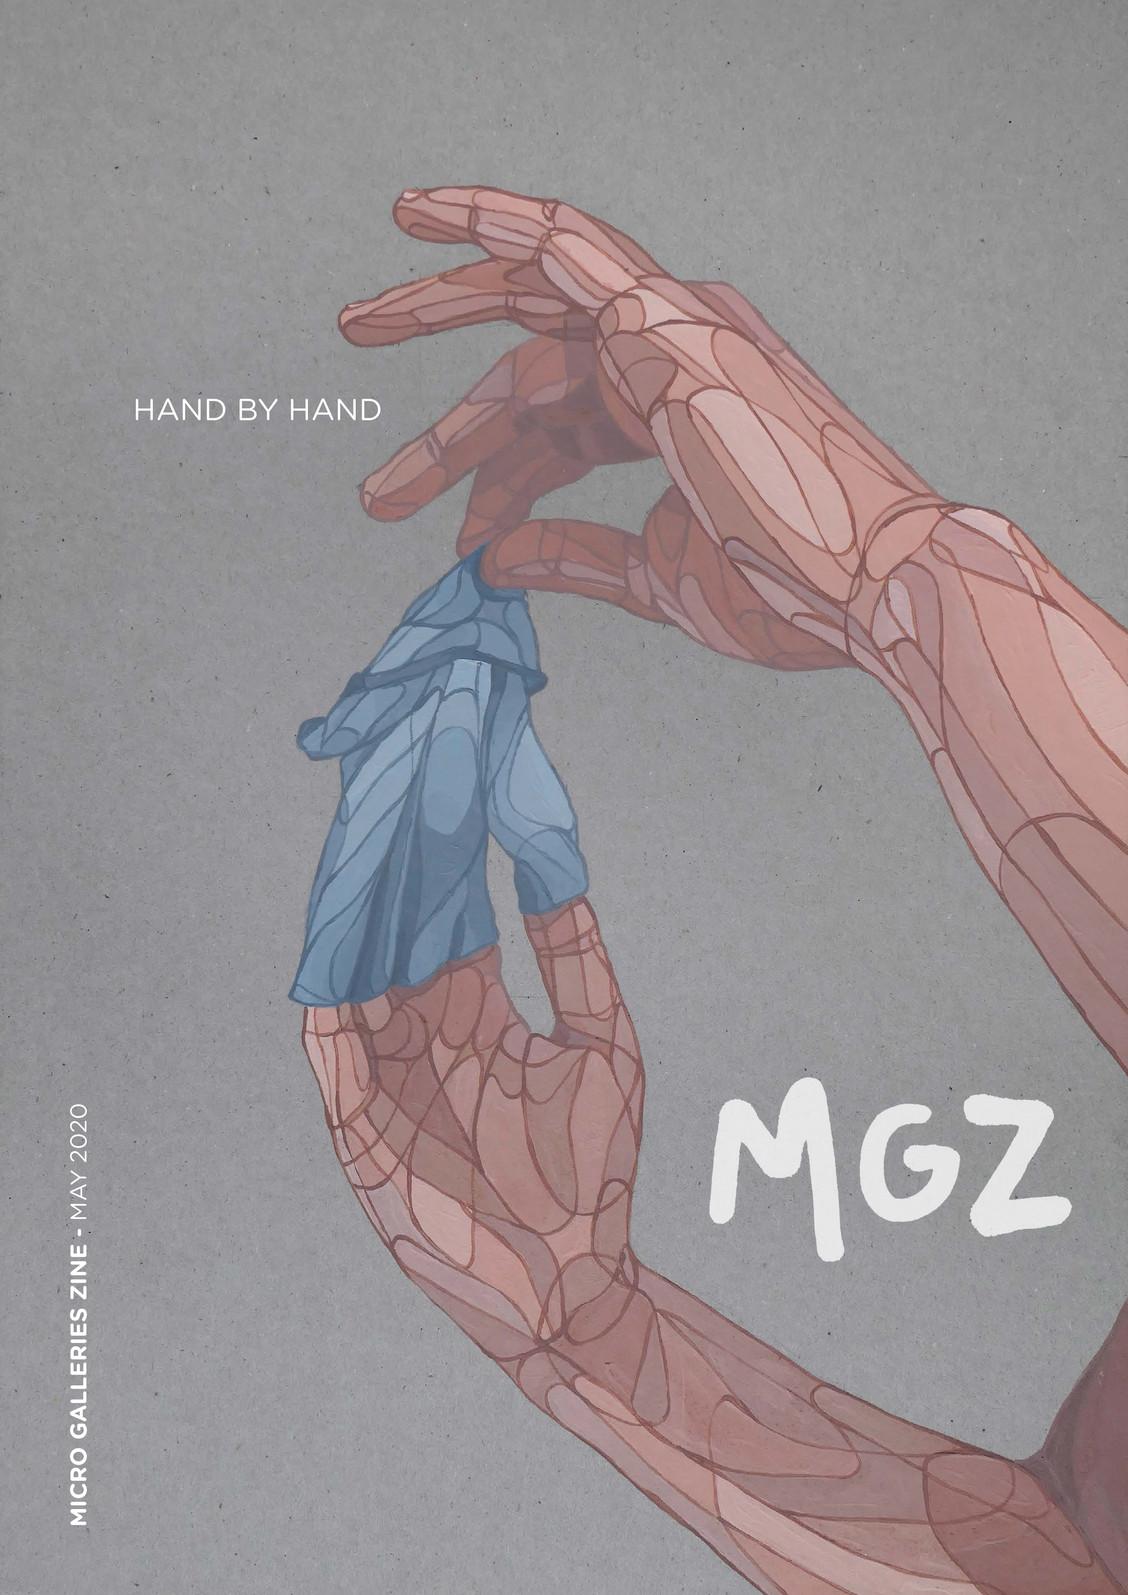 MGZ - Micro Galleries zine